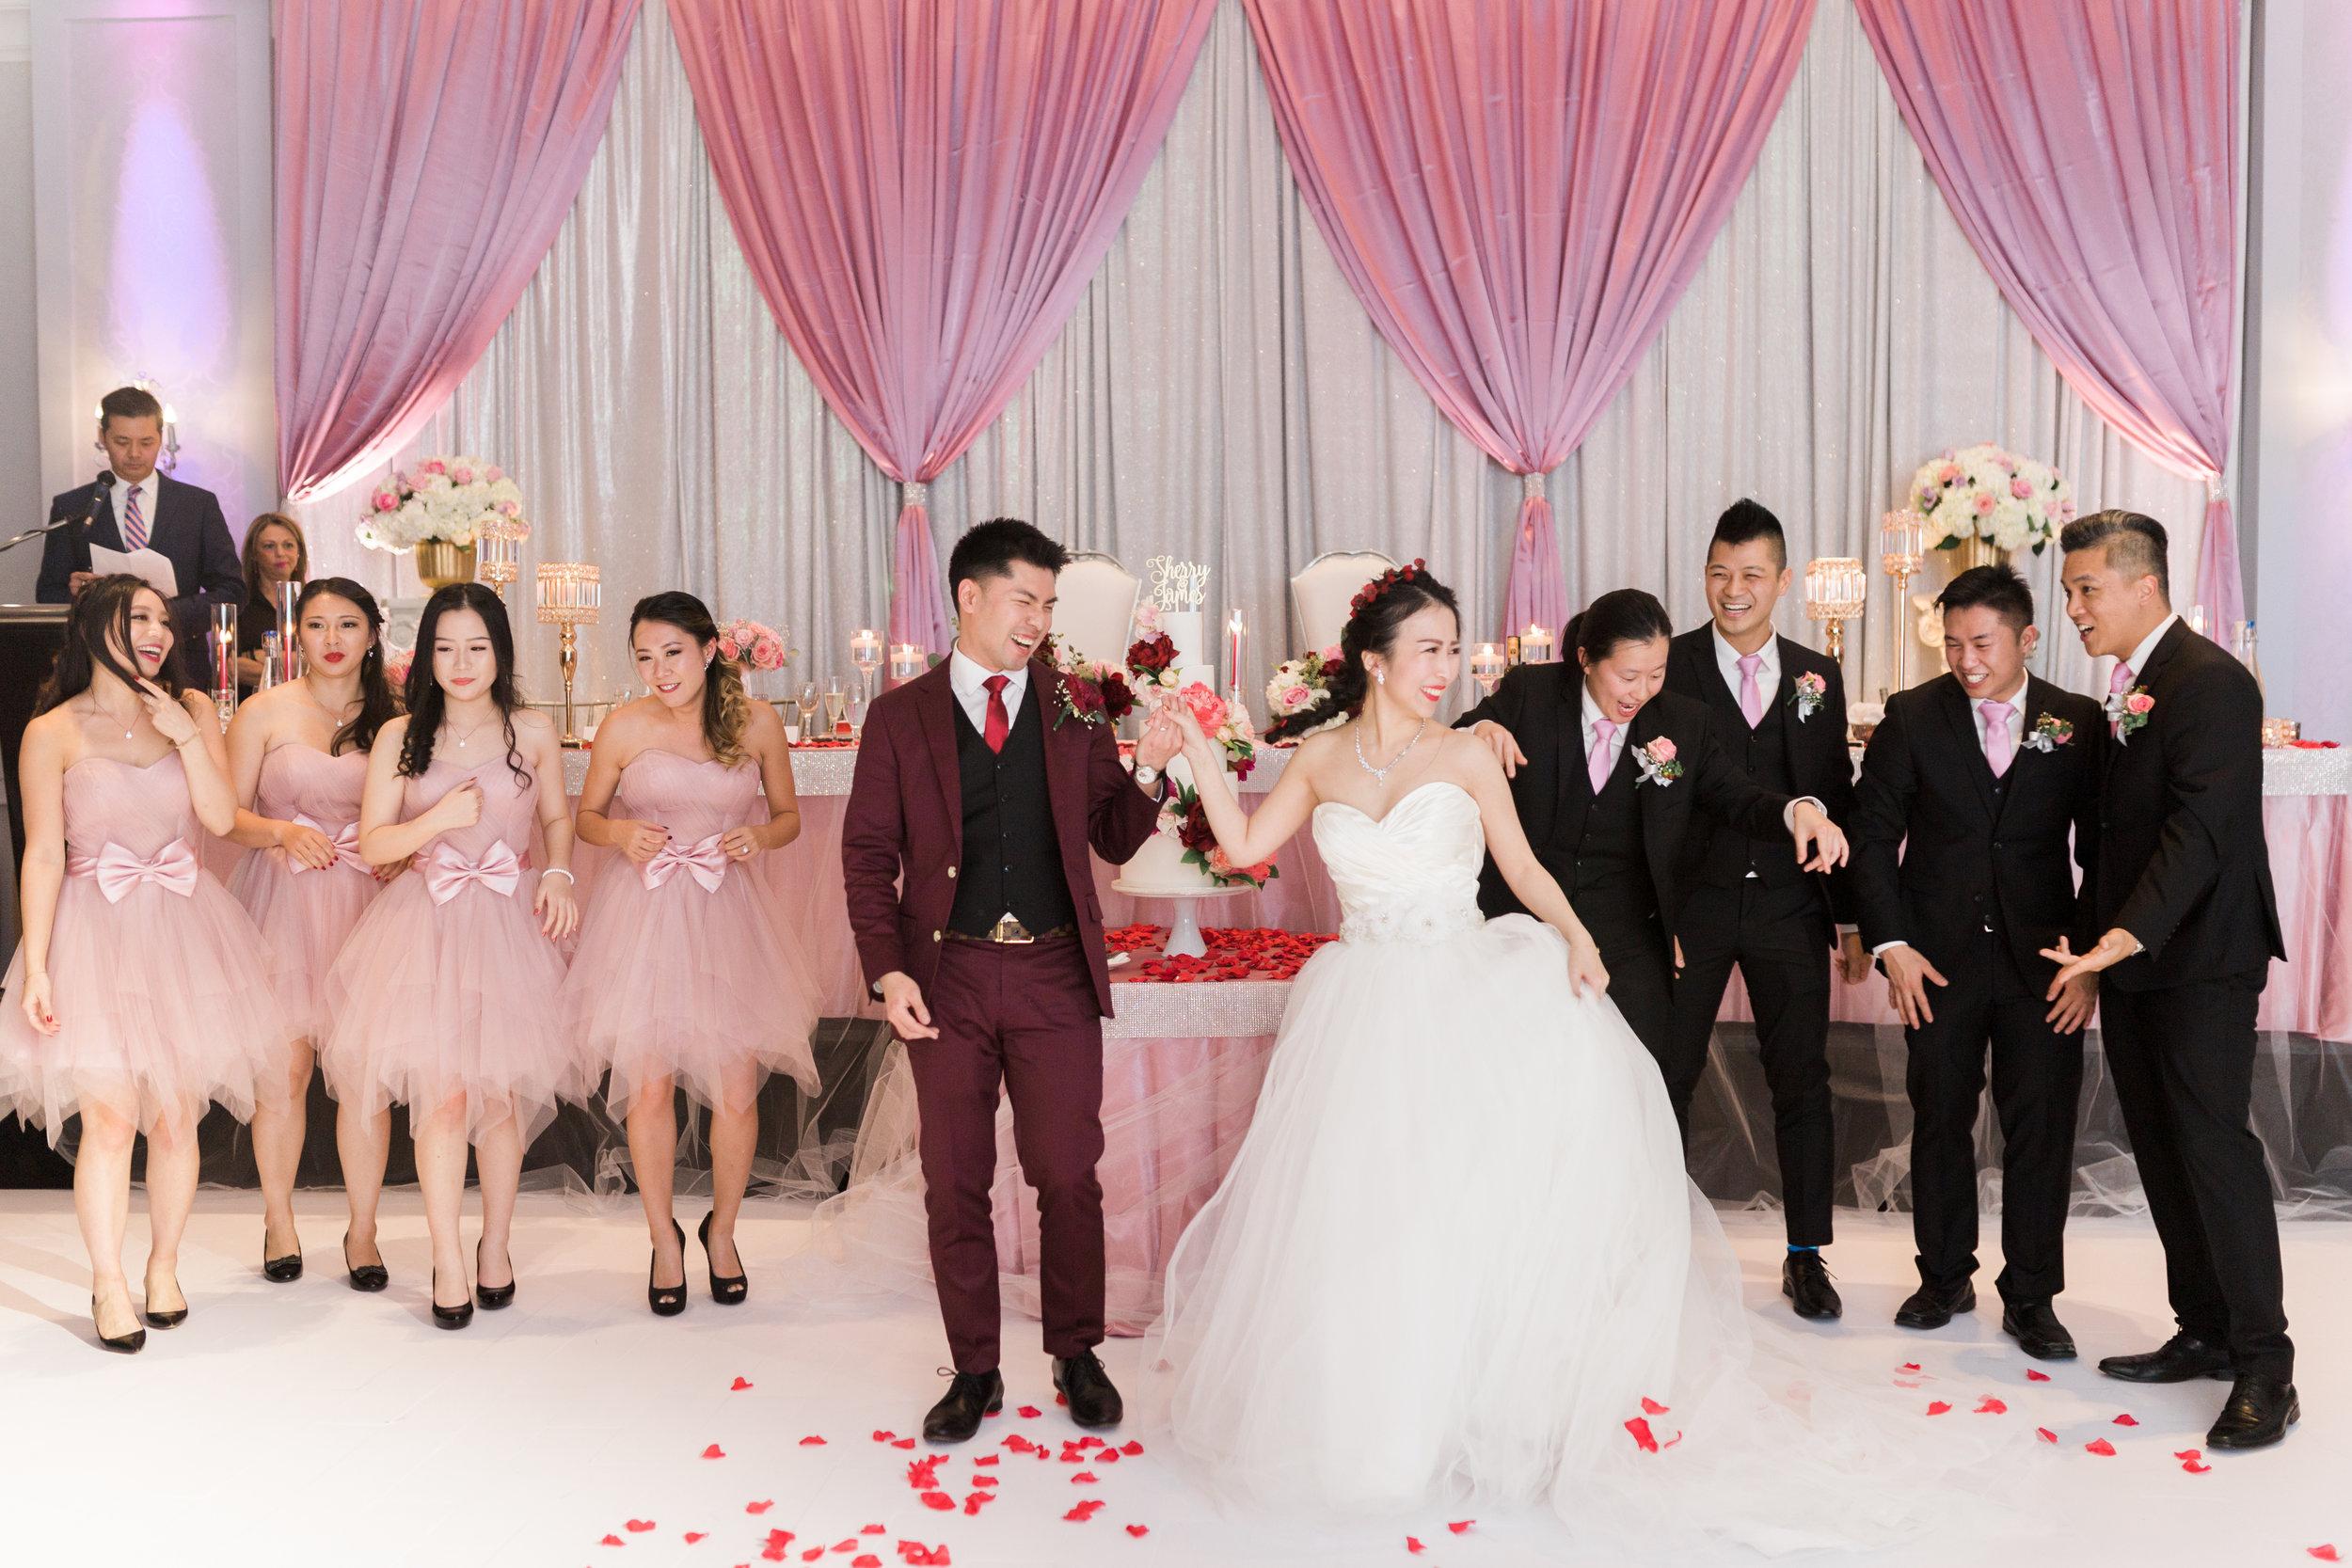 Parkview Manor Wedding - Reception-50.jpg